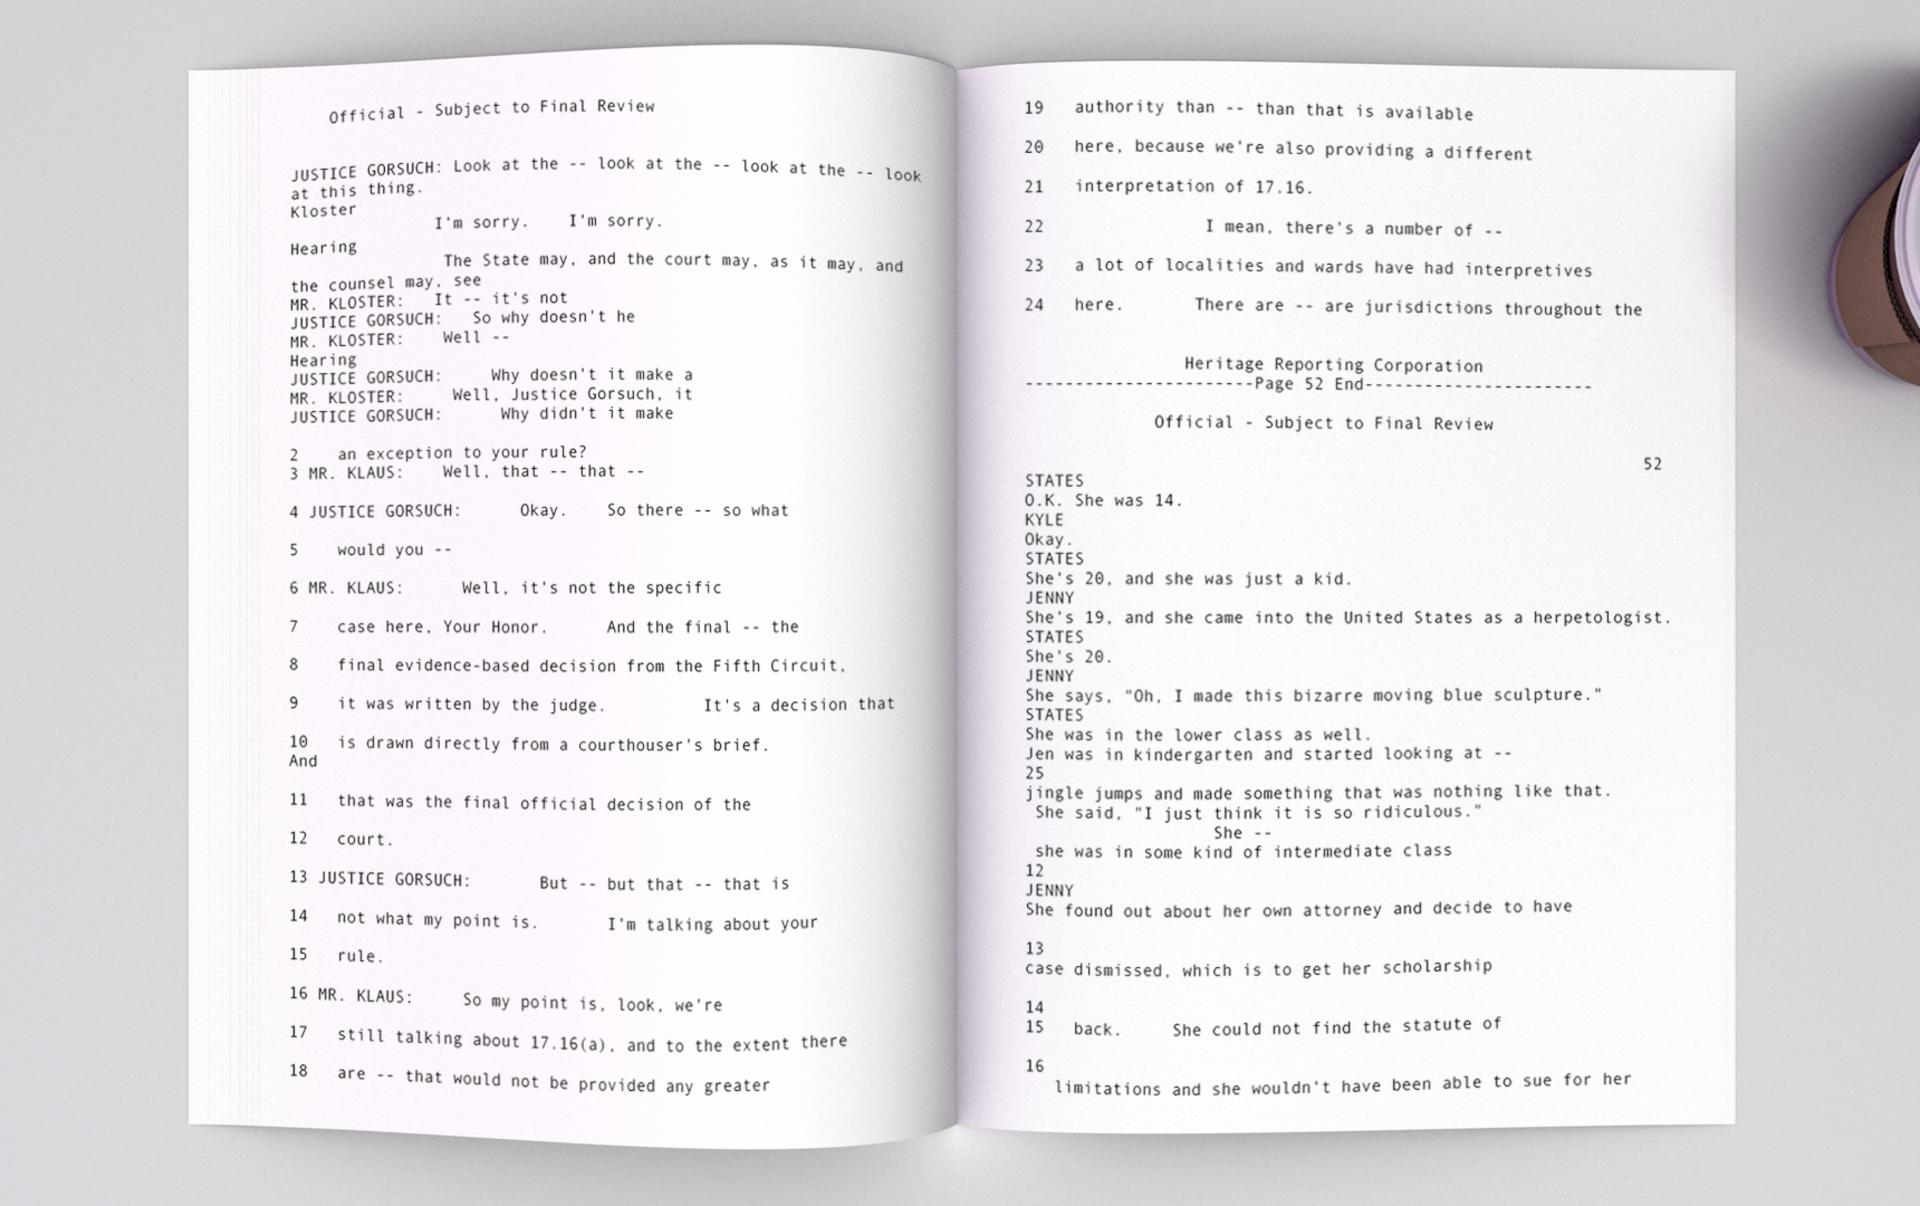 1 James v Birnmann script by AI GPT-2